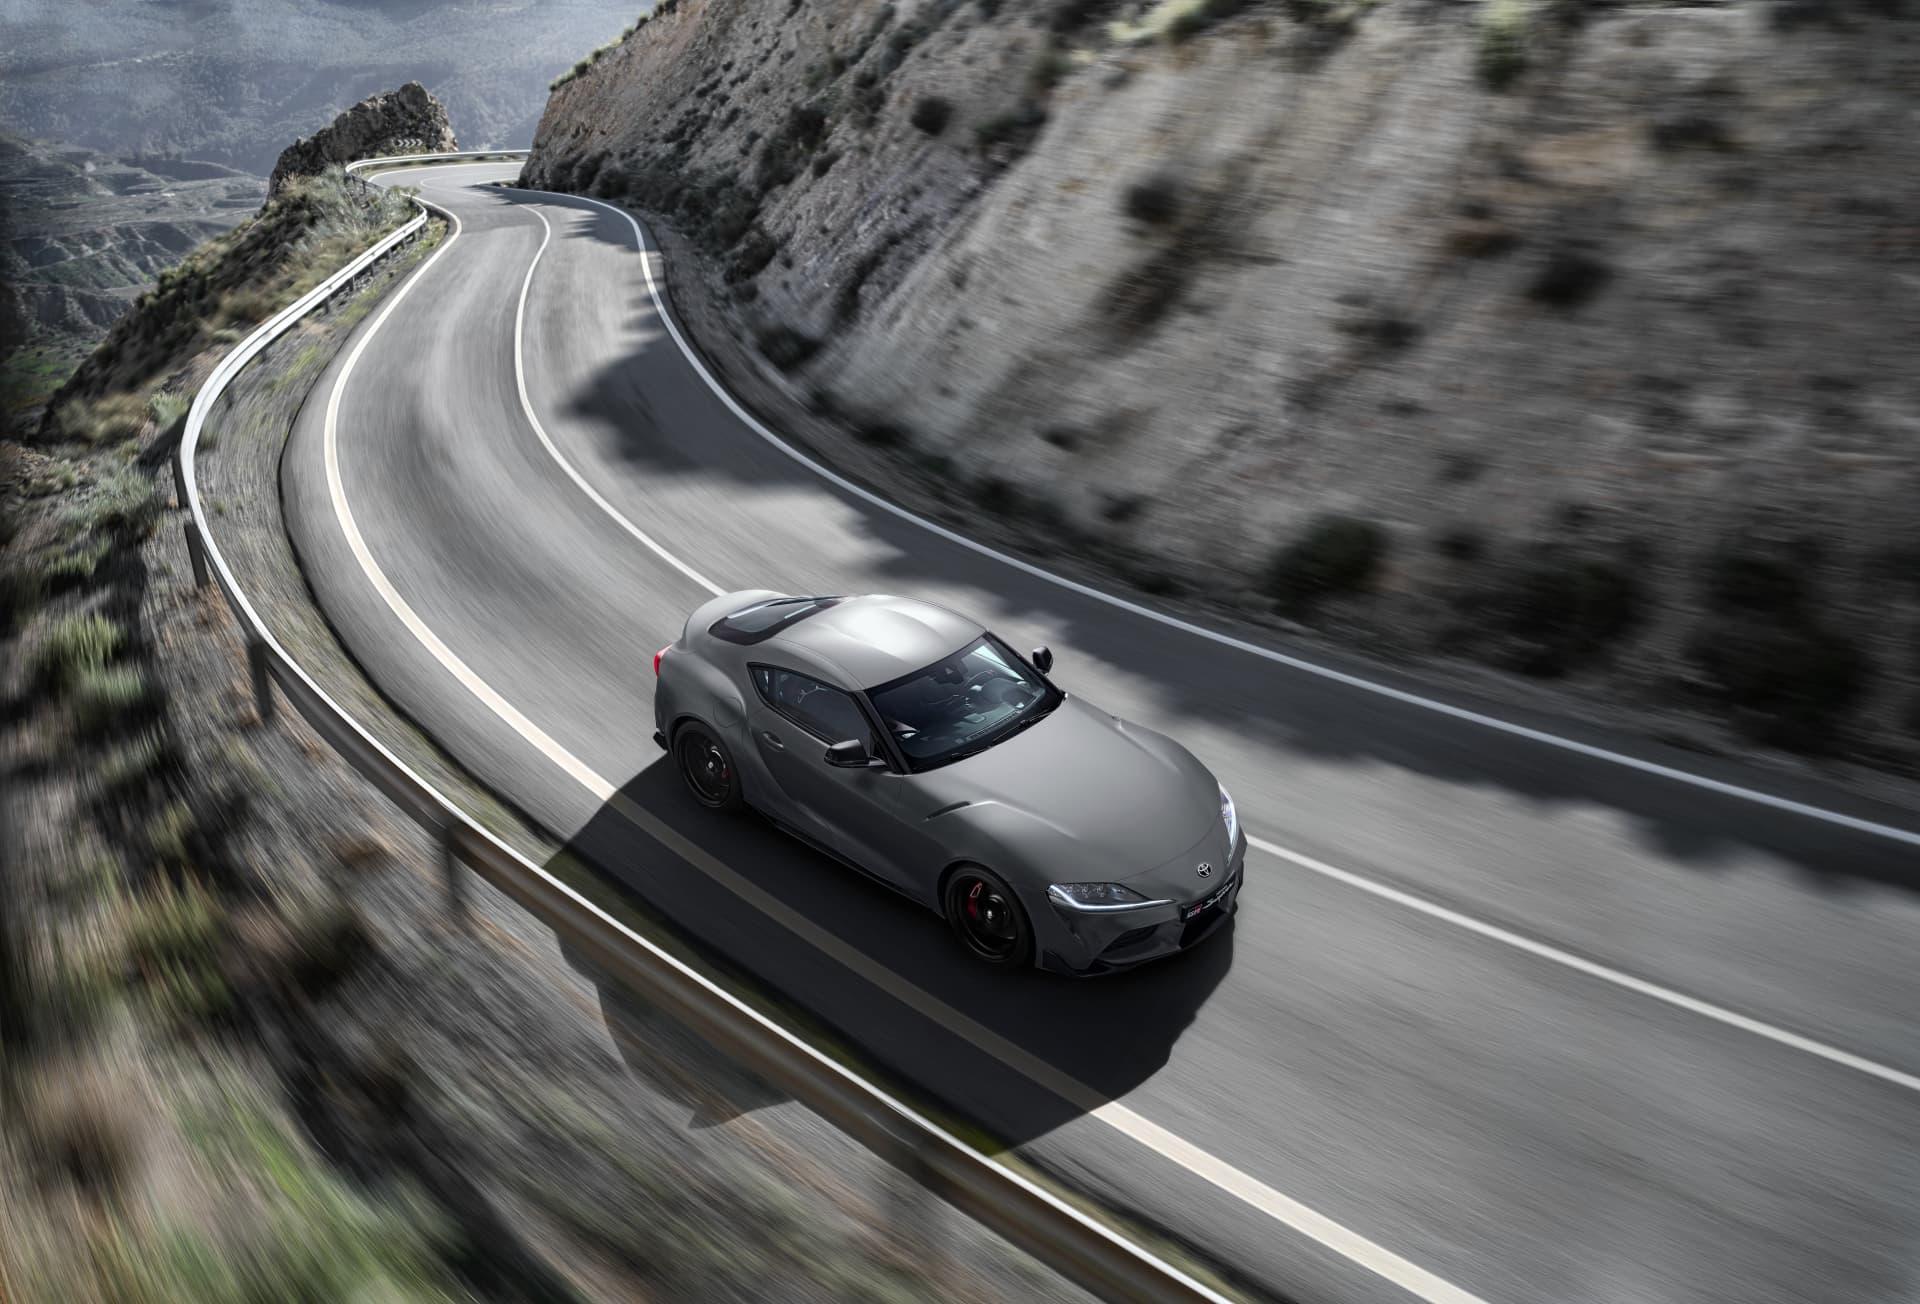 Toyota Supra Gris 2019 Toyota Supra Grey Location 007 333496